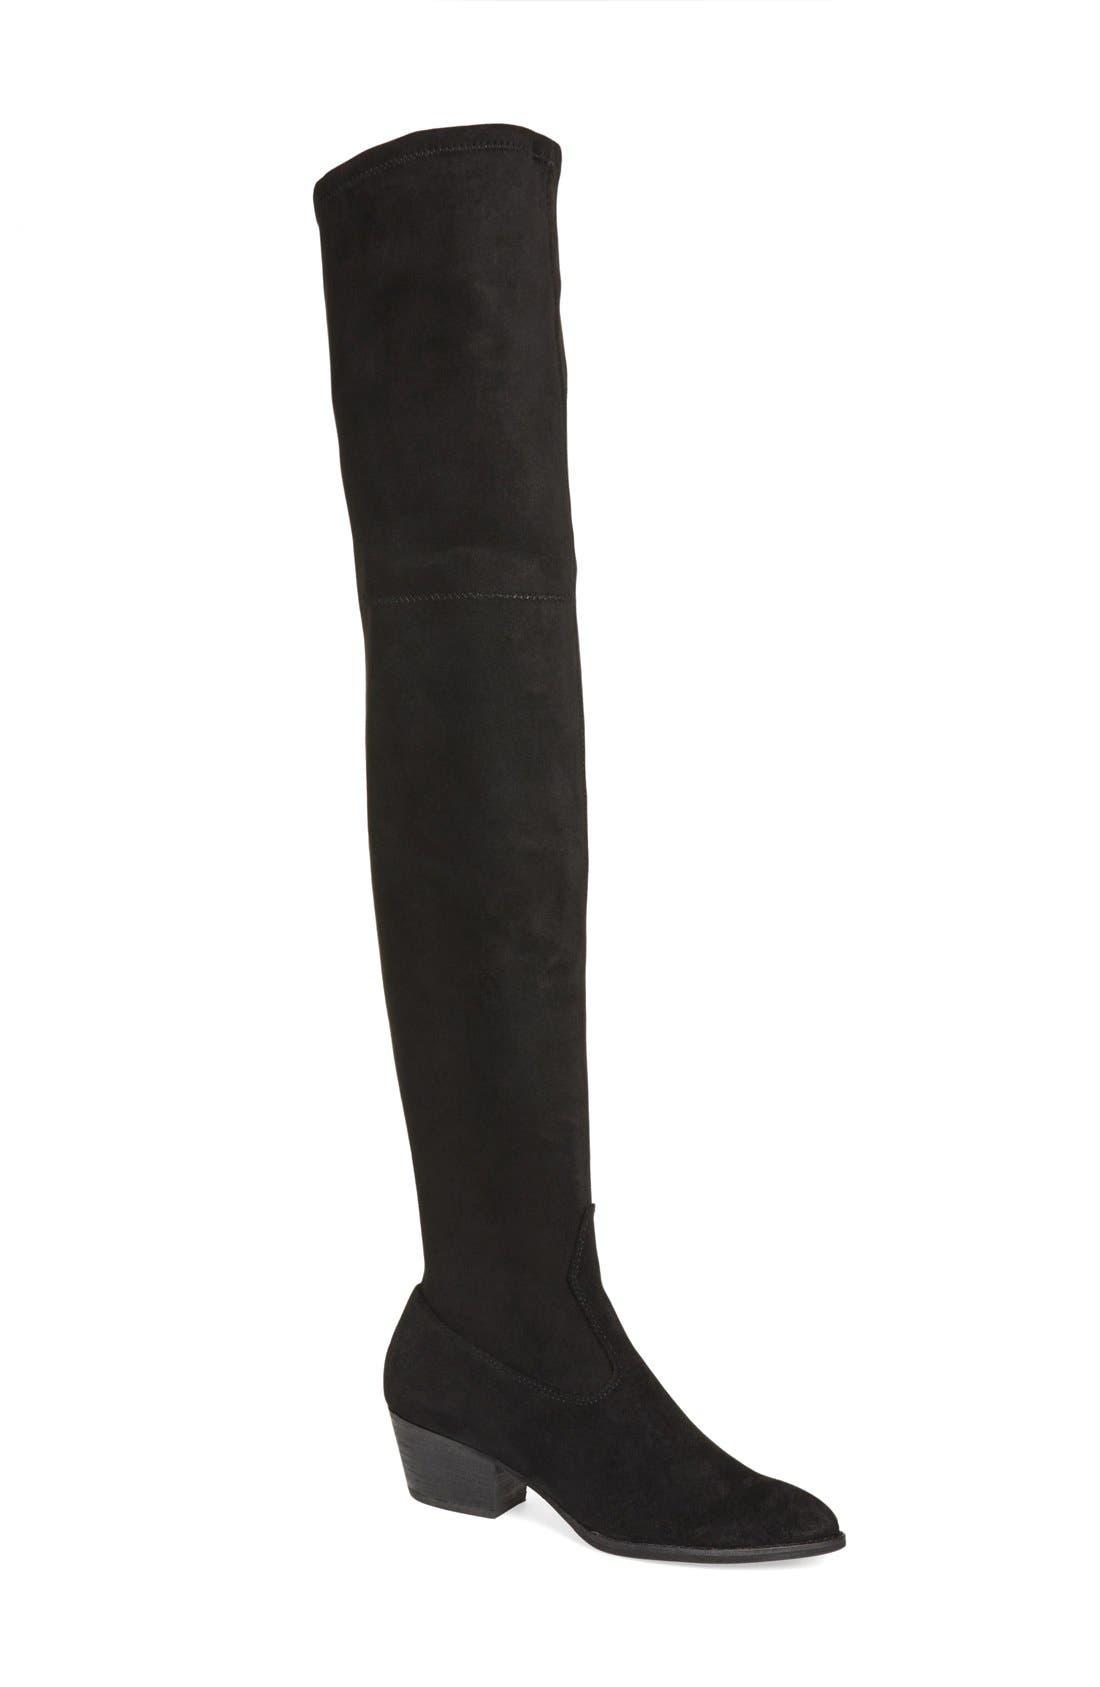 'Sparrow' Thigh High Almond Toe Boot,                             Main thumbnail 1, color,                             001